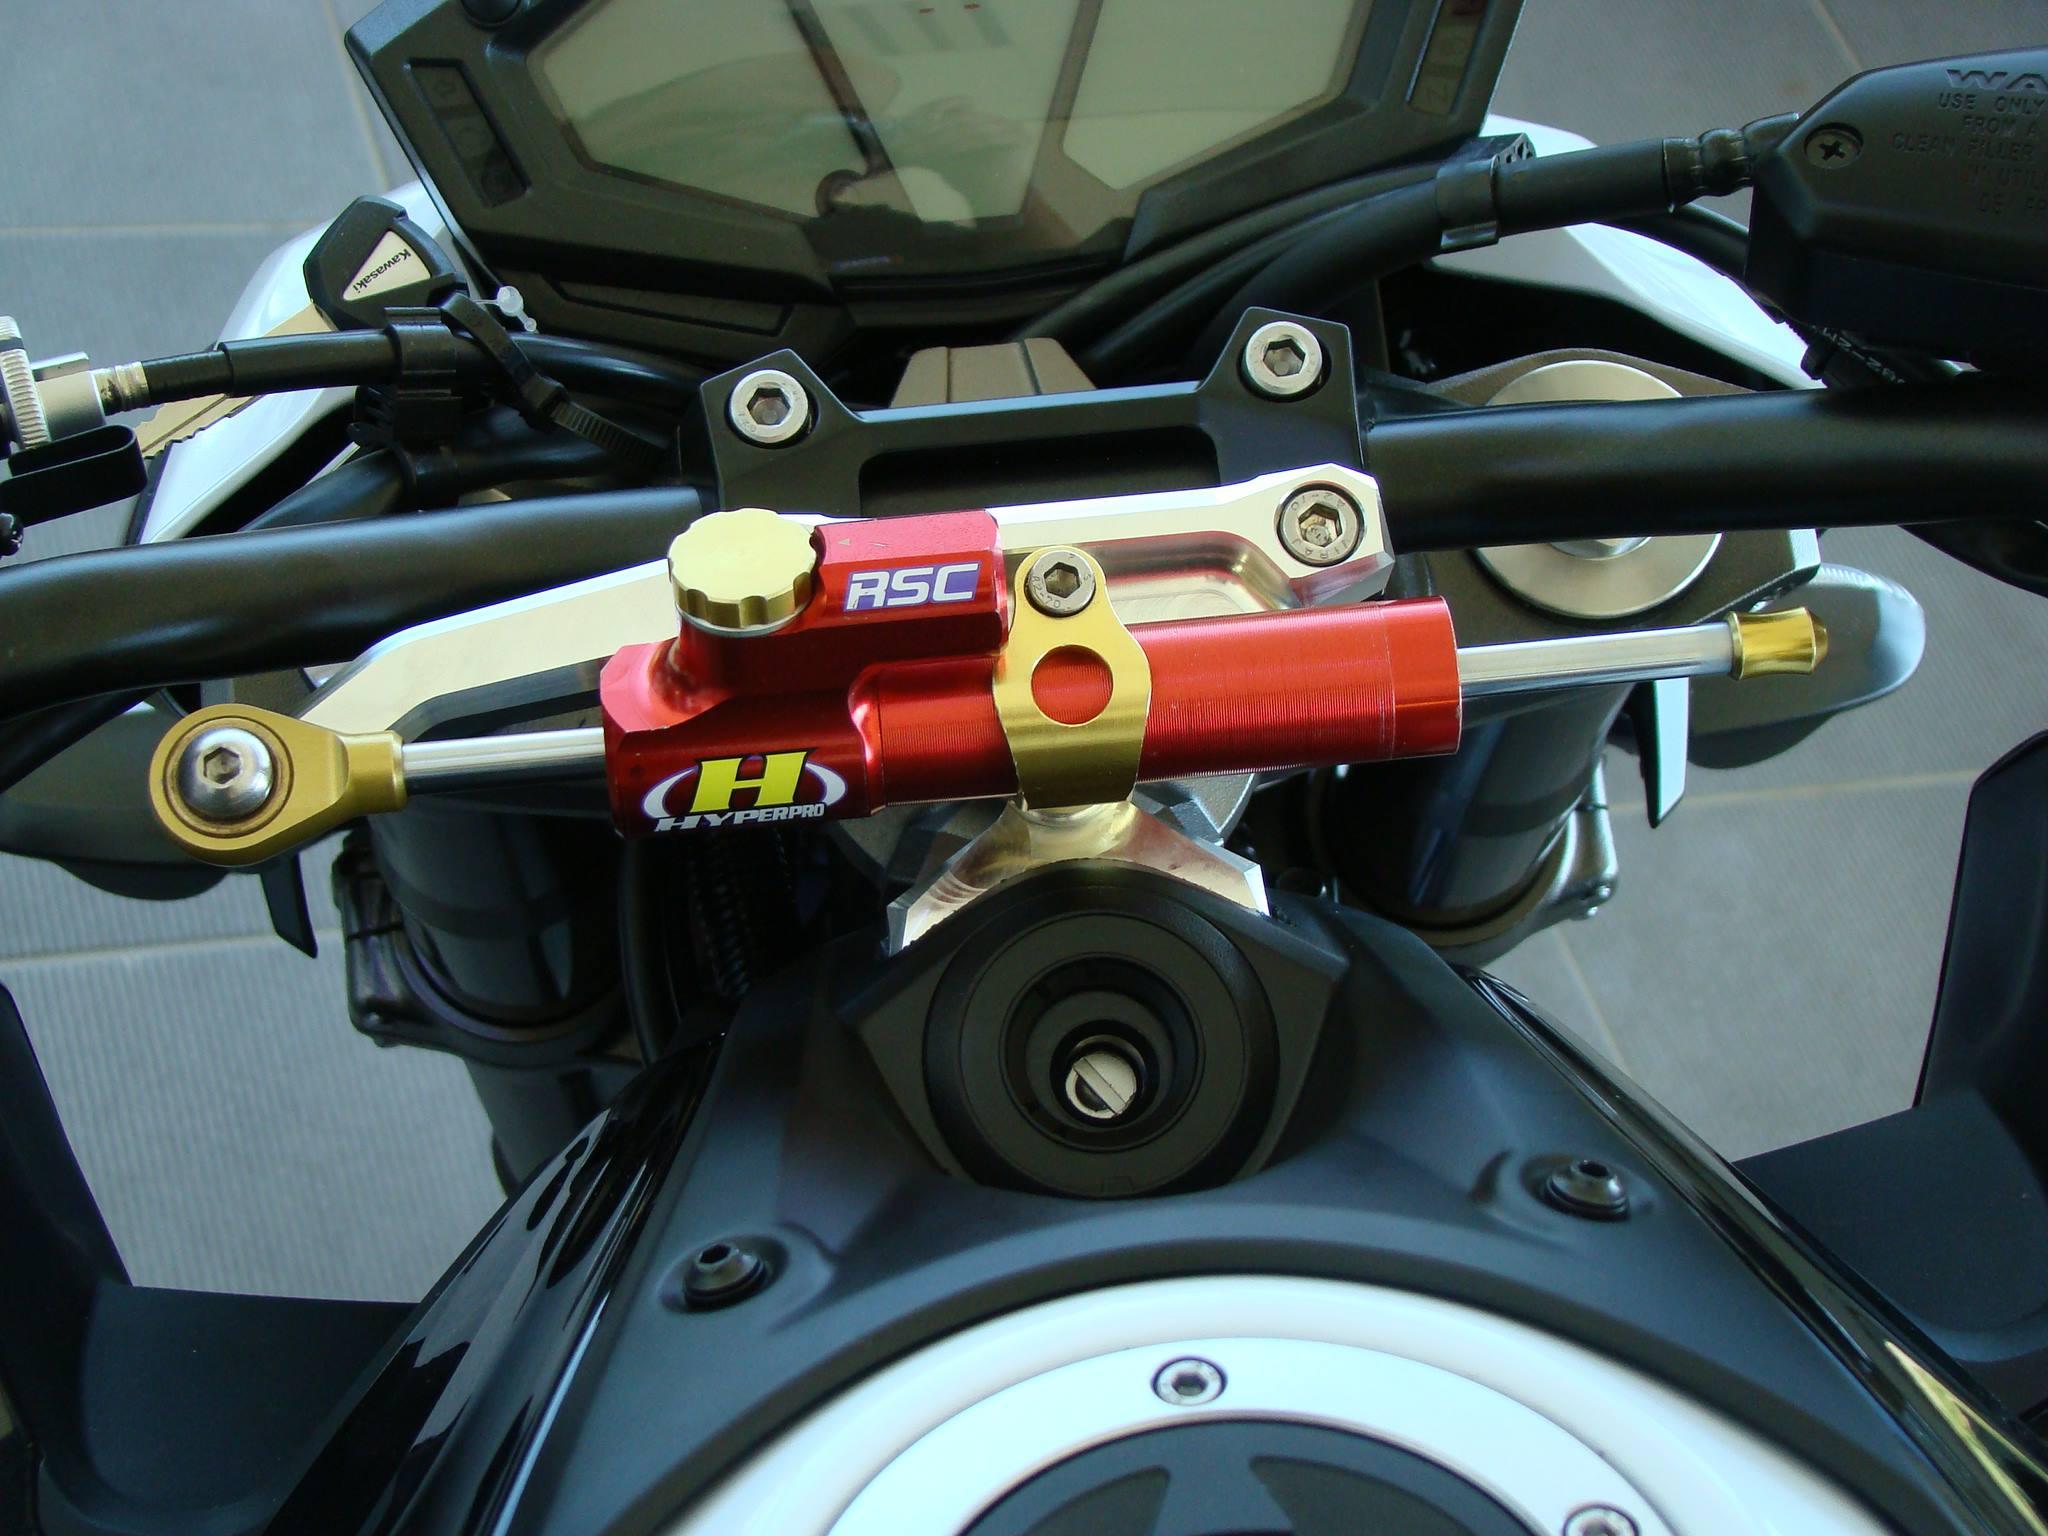 Suspension For Kawasaki Z800 Hyperpro